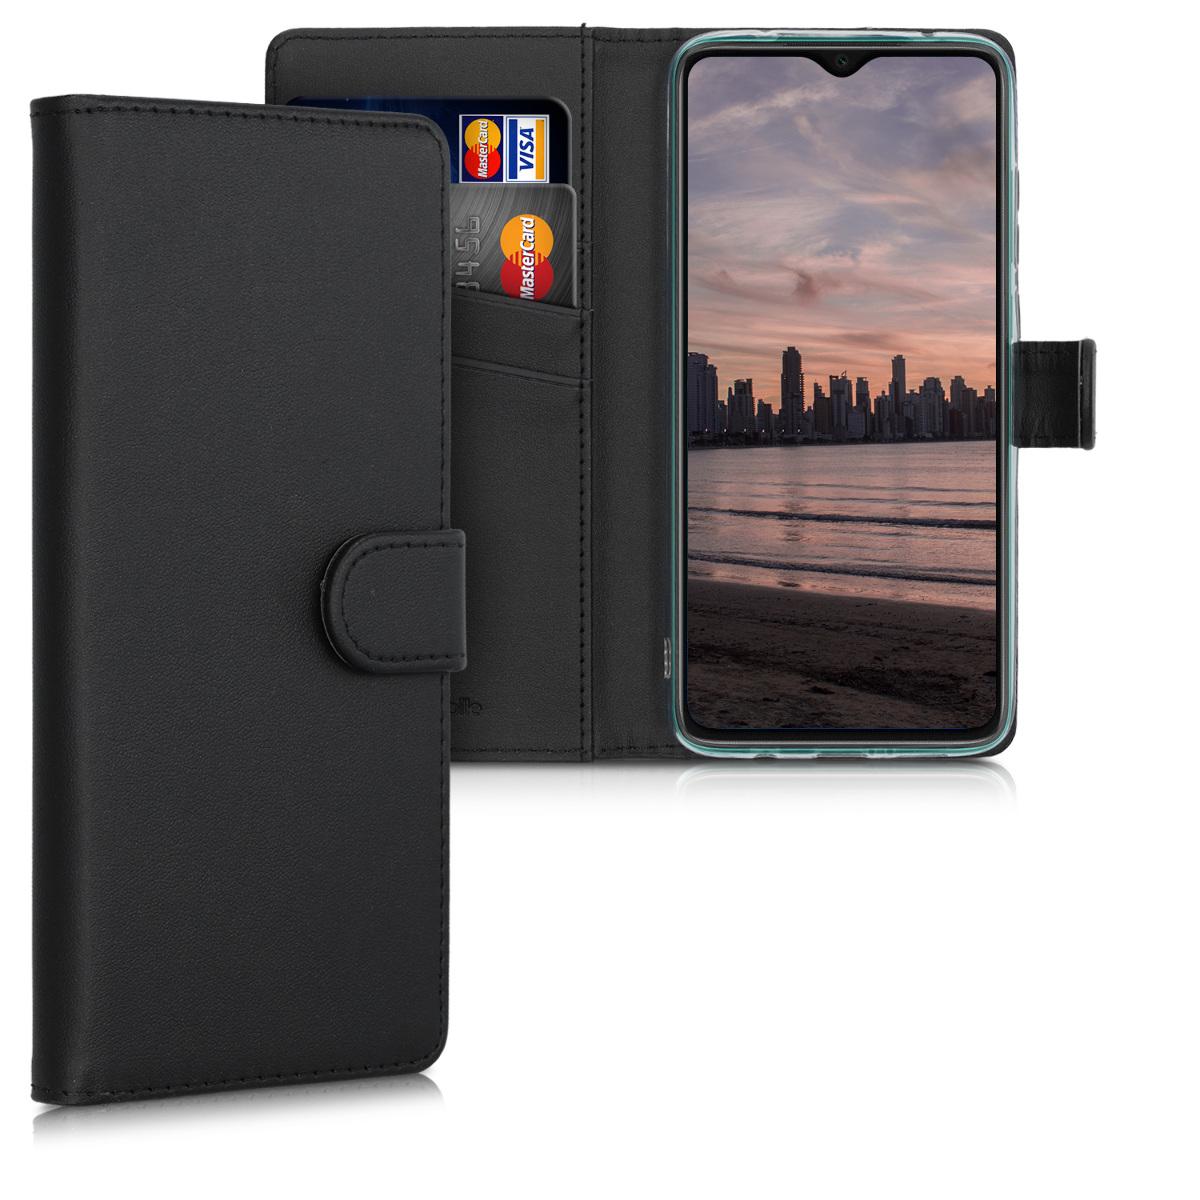 KW Θήκη - Πορτοφόλι Xiaomi Redmi Note 8 Pro - Protective PU Leather Flip Cover - Black (50837.01)